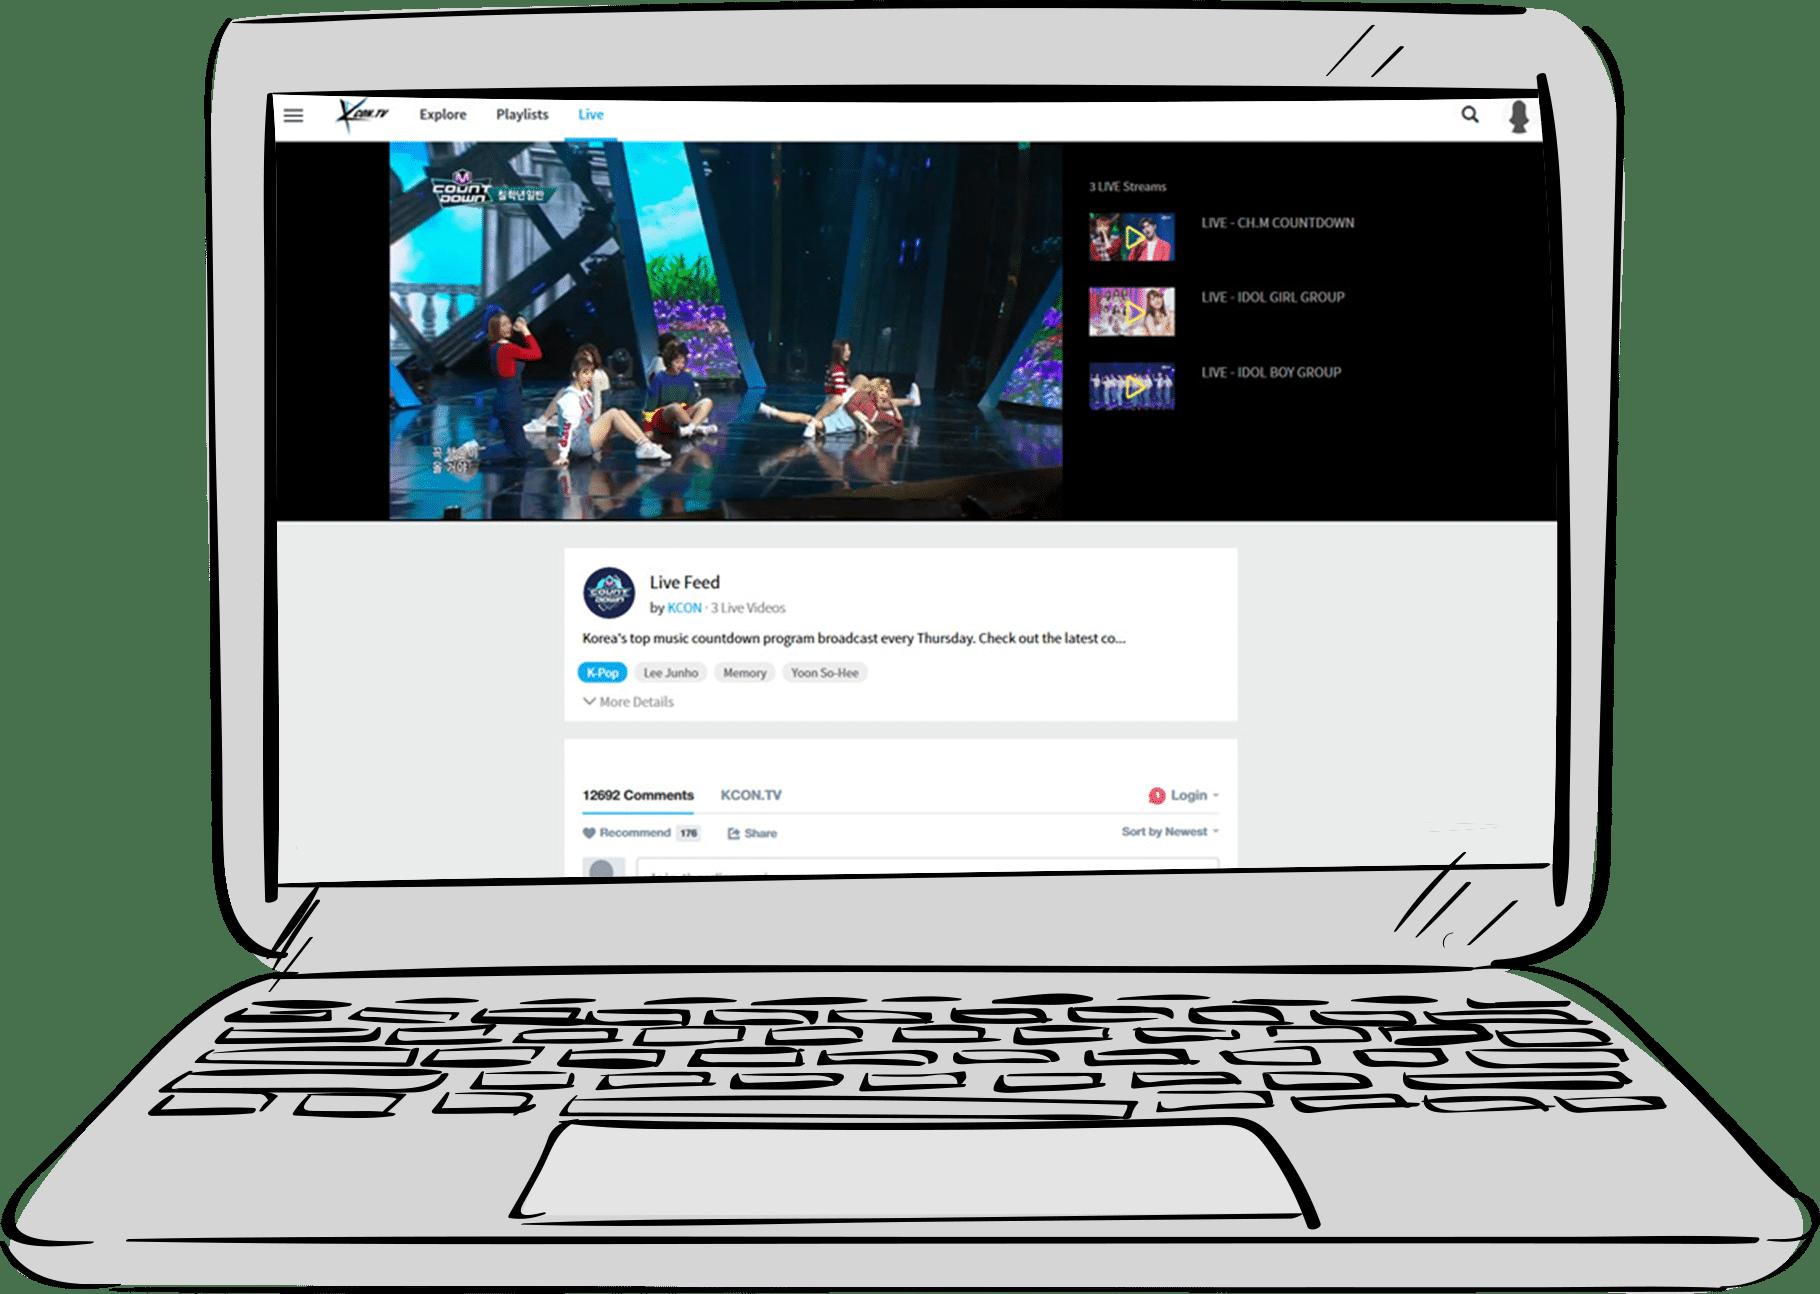 KCON Website Design and Development